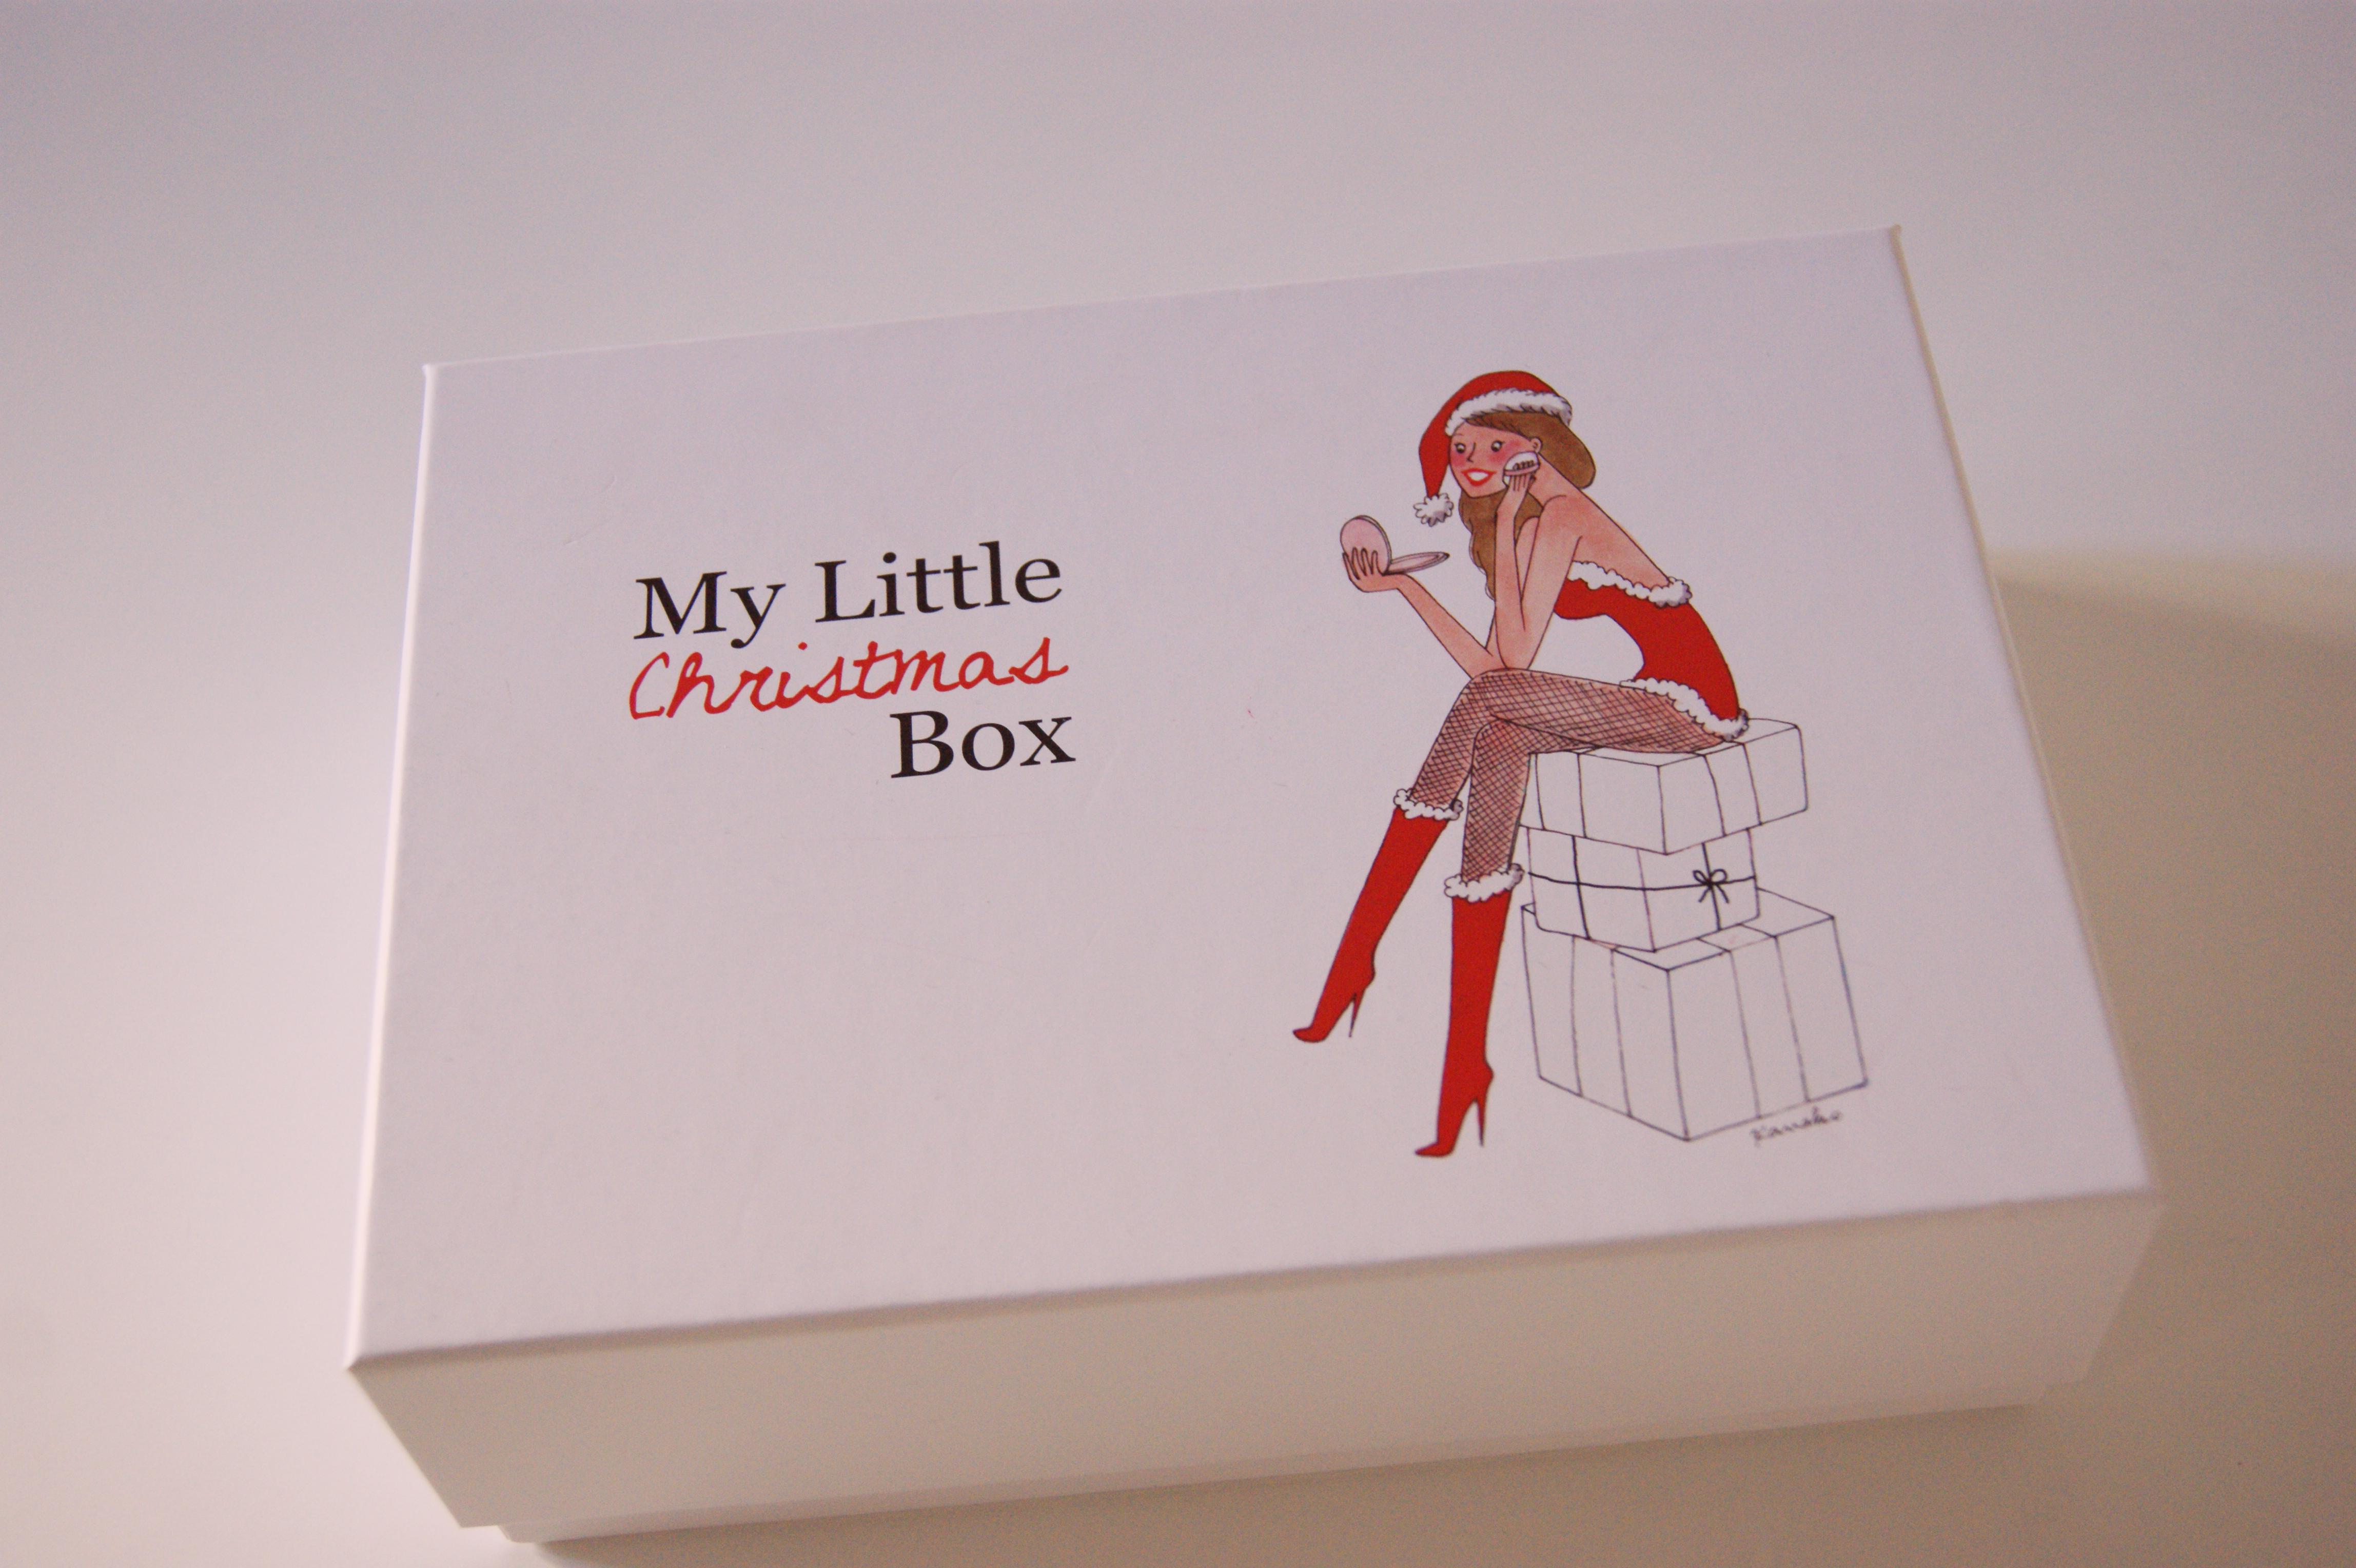 My Little Christmas Box